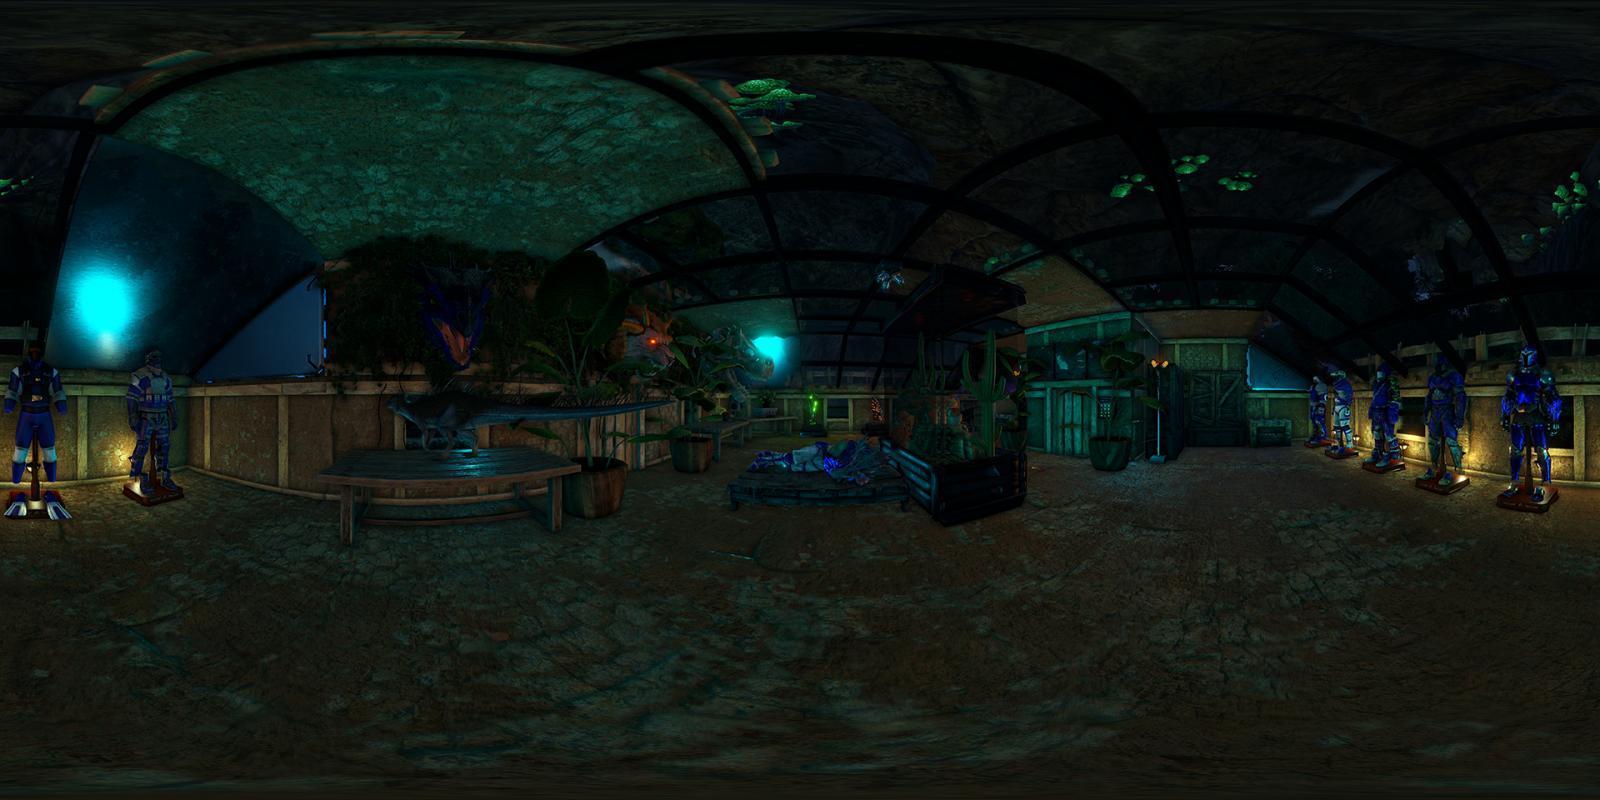 large.59f3d6fa7dbc0_Vakarian-SleepatNight-Panoramic360Steroscopic3D.jpg